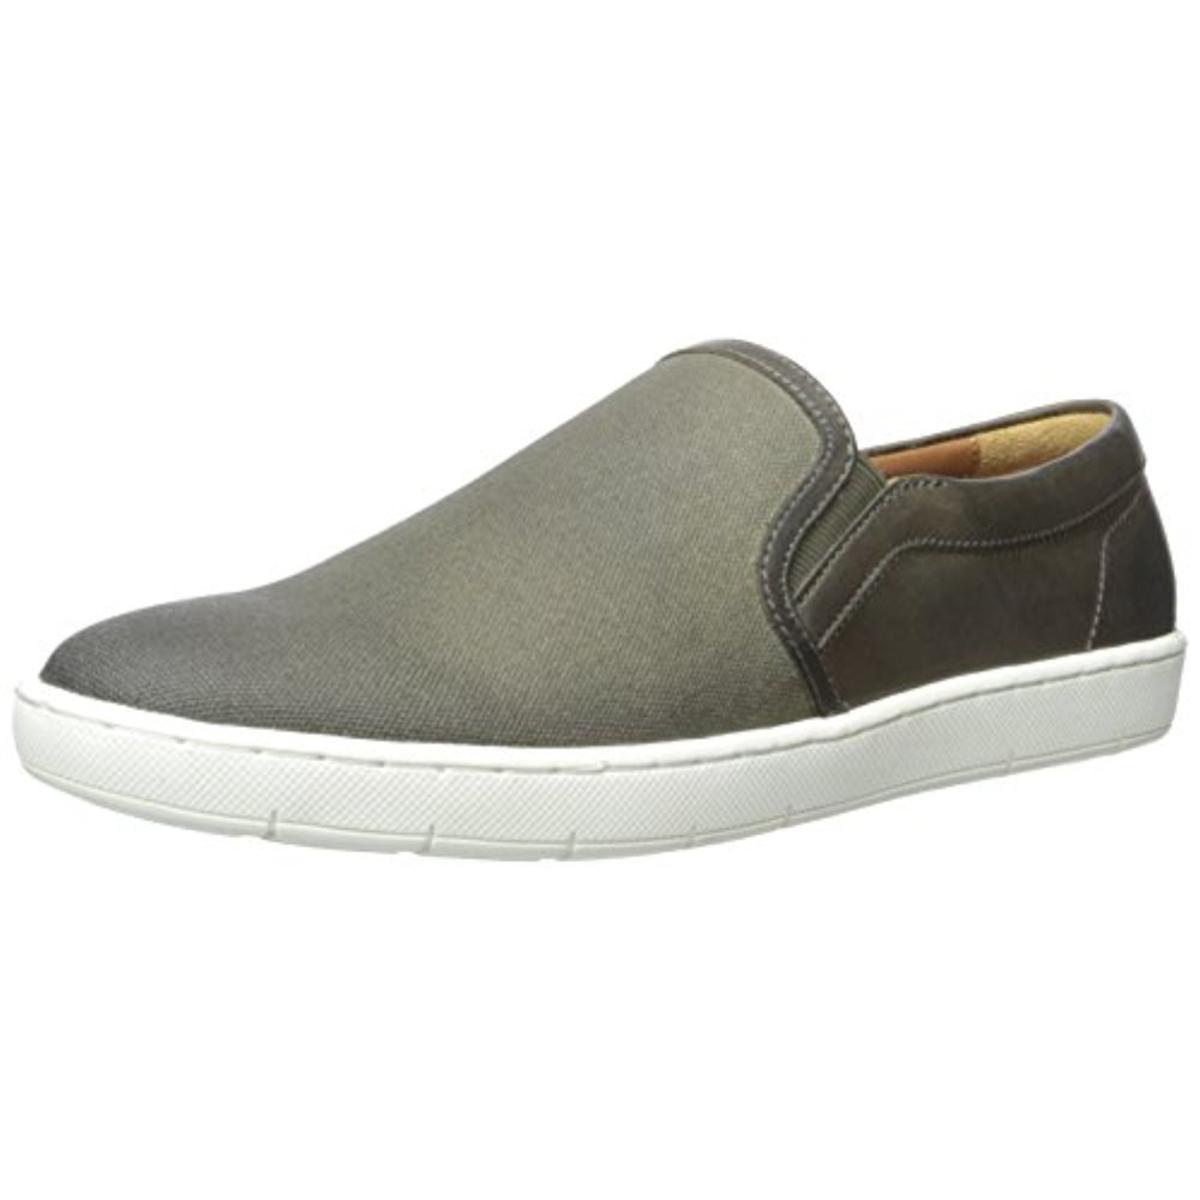 Gordon Rush Mens Tulley Leather Slip On Fashion Sneakers